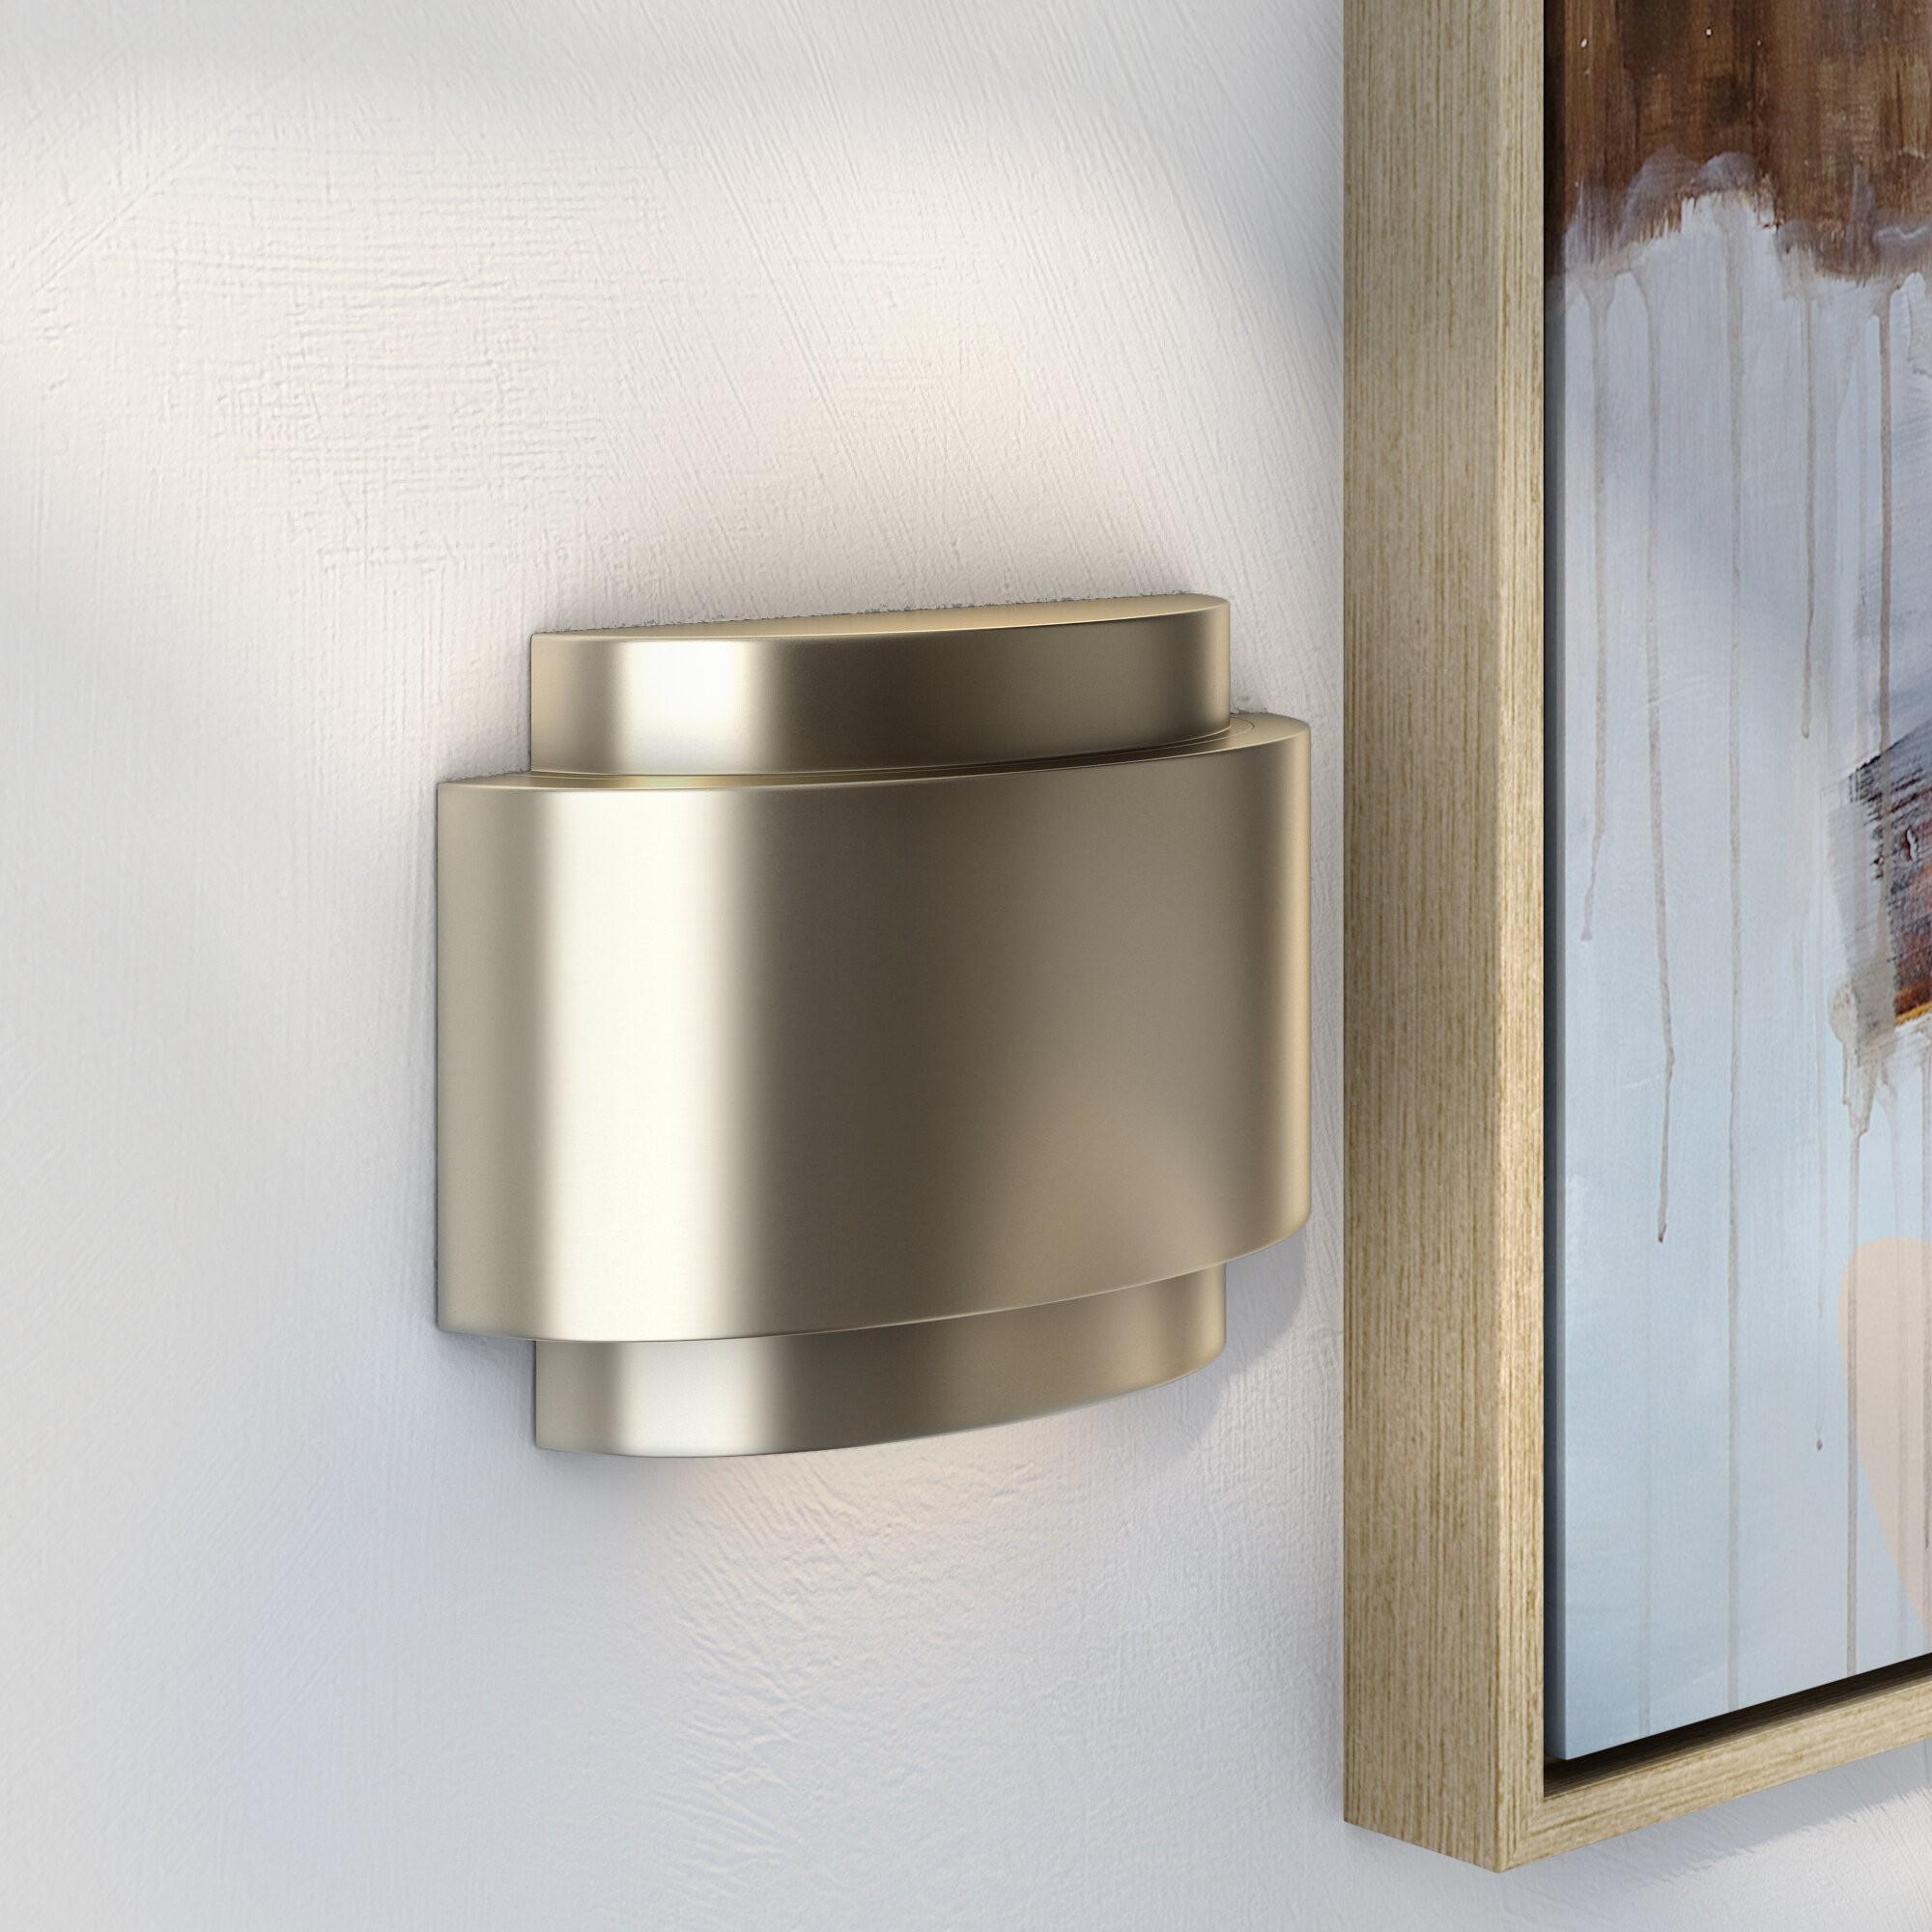 10 Best Doorbells Chimes For 2021 Ideas On Foter